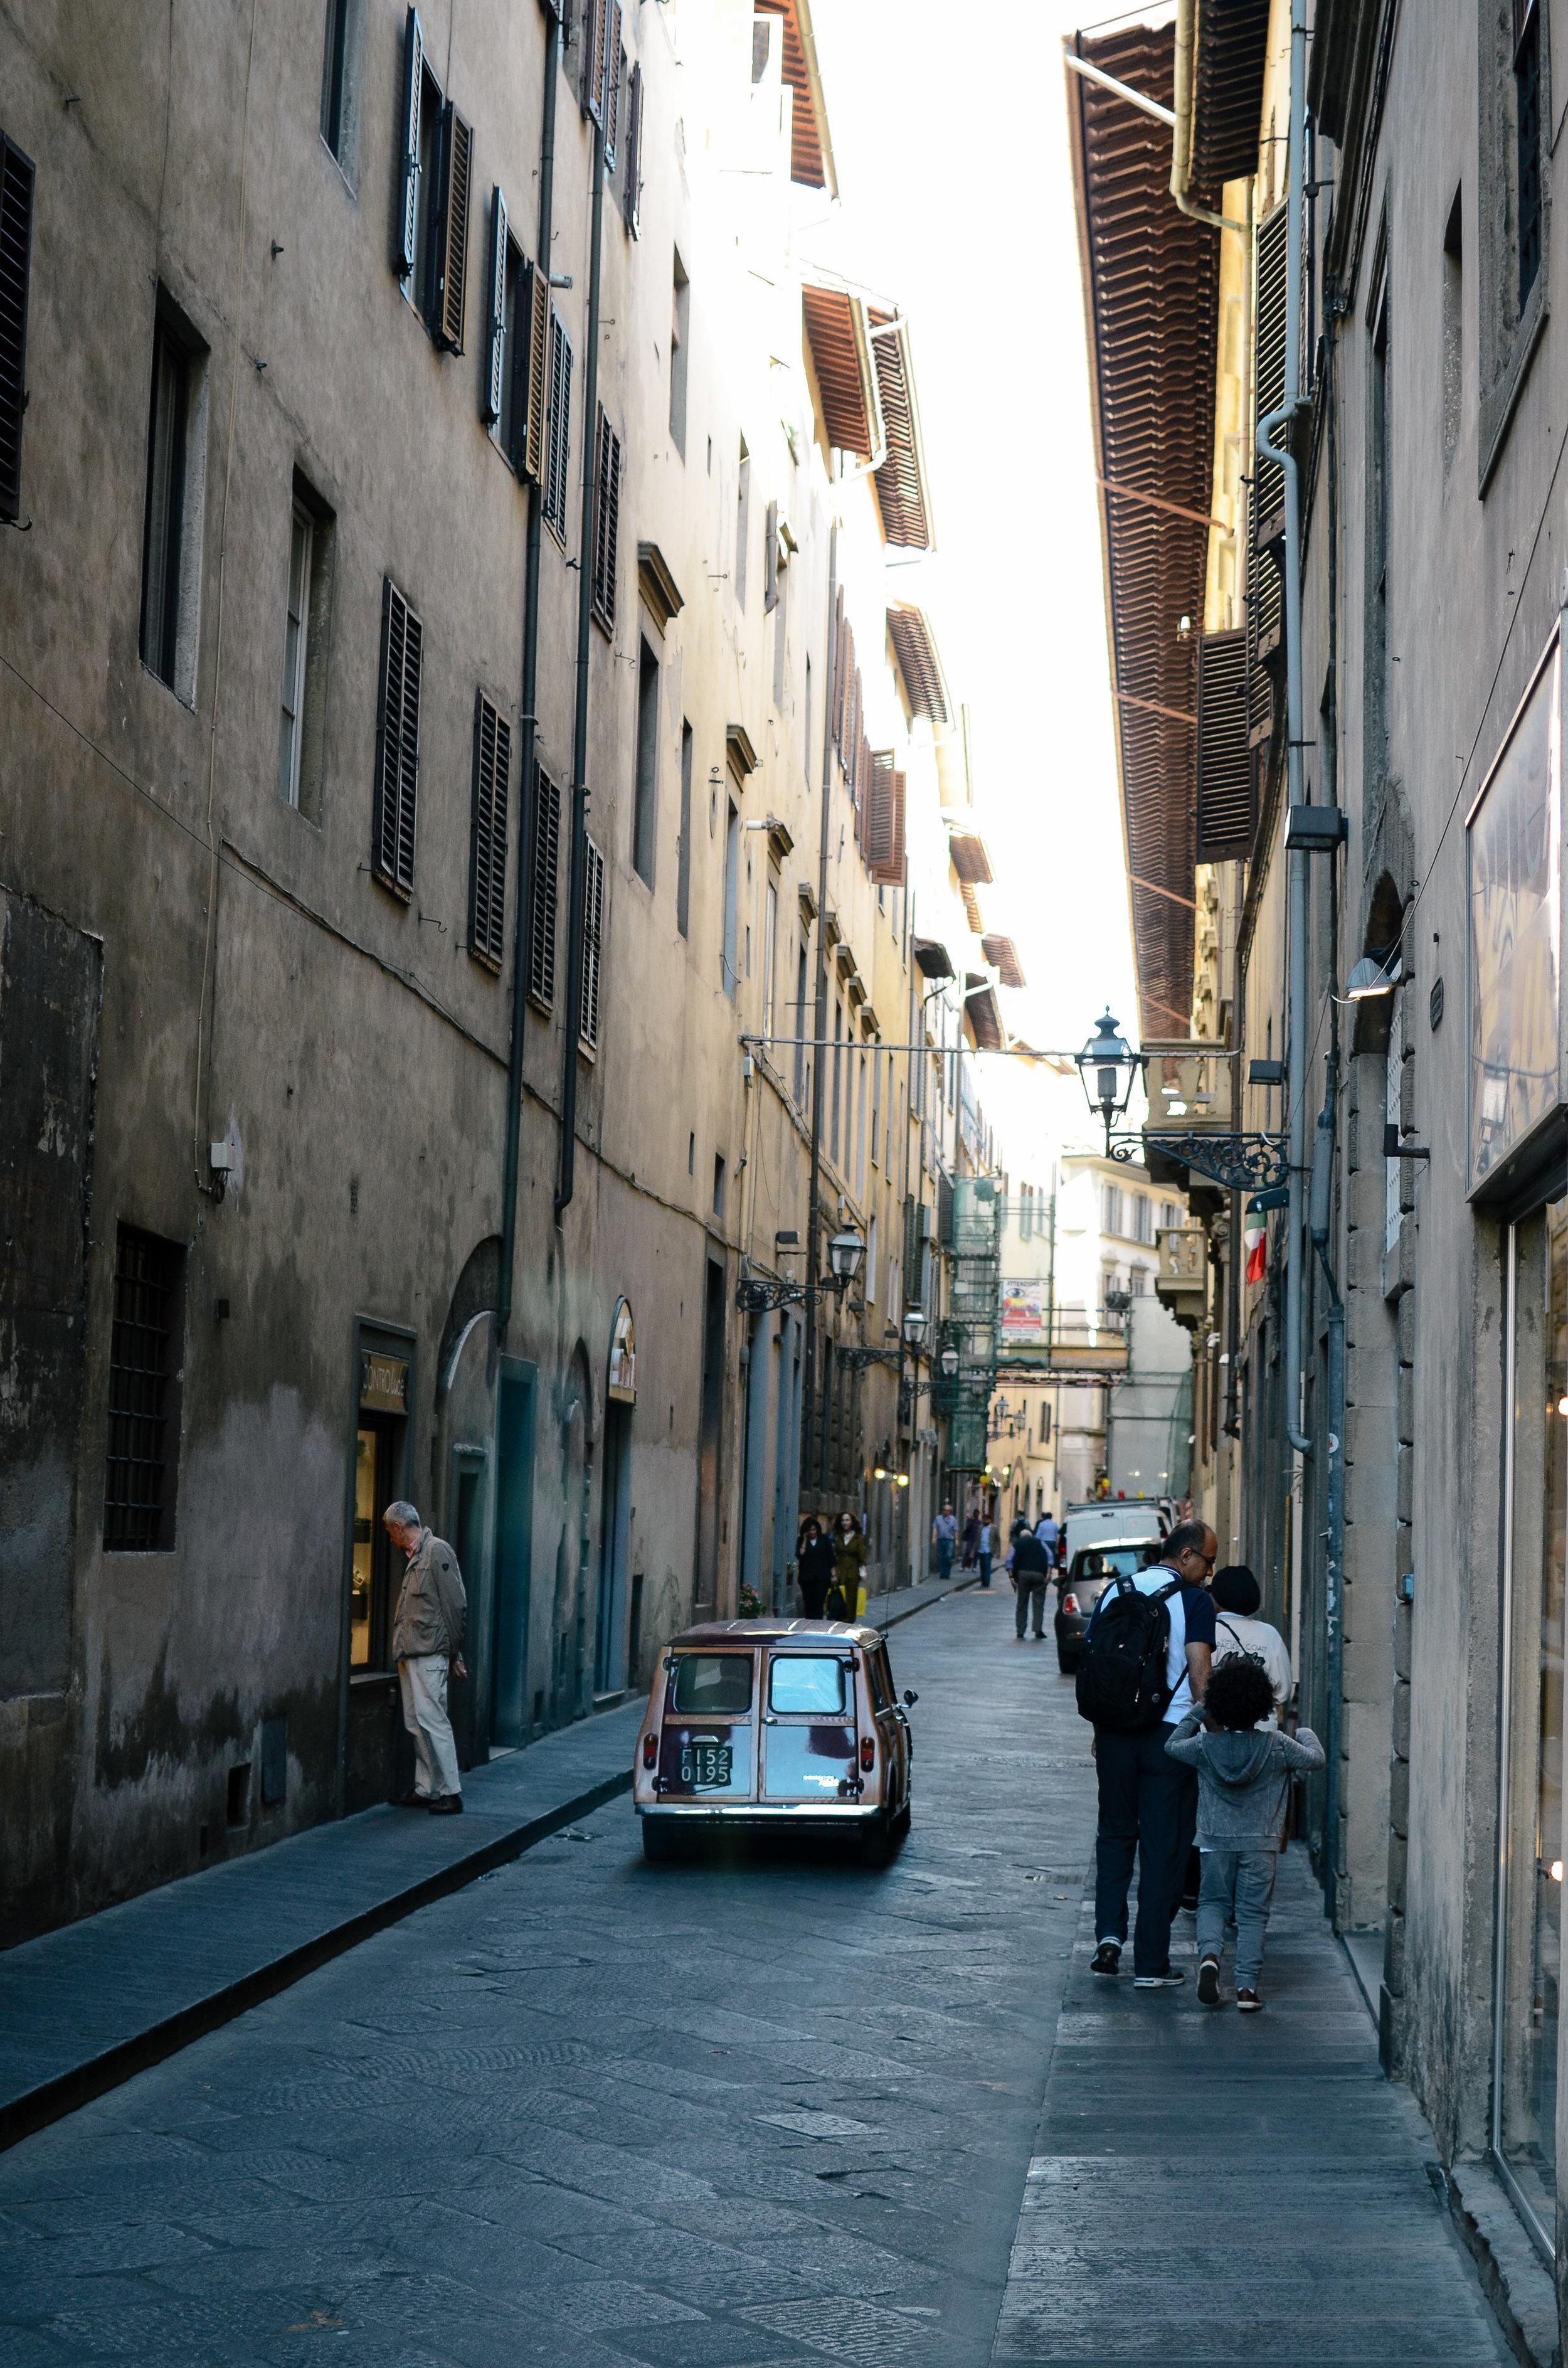 florence-italy-travel-guide-adventure-blog_DSC_0187.jpg